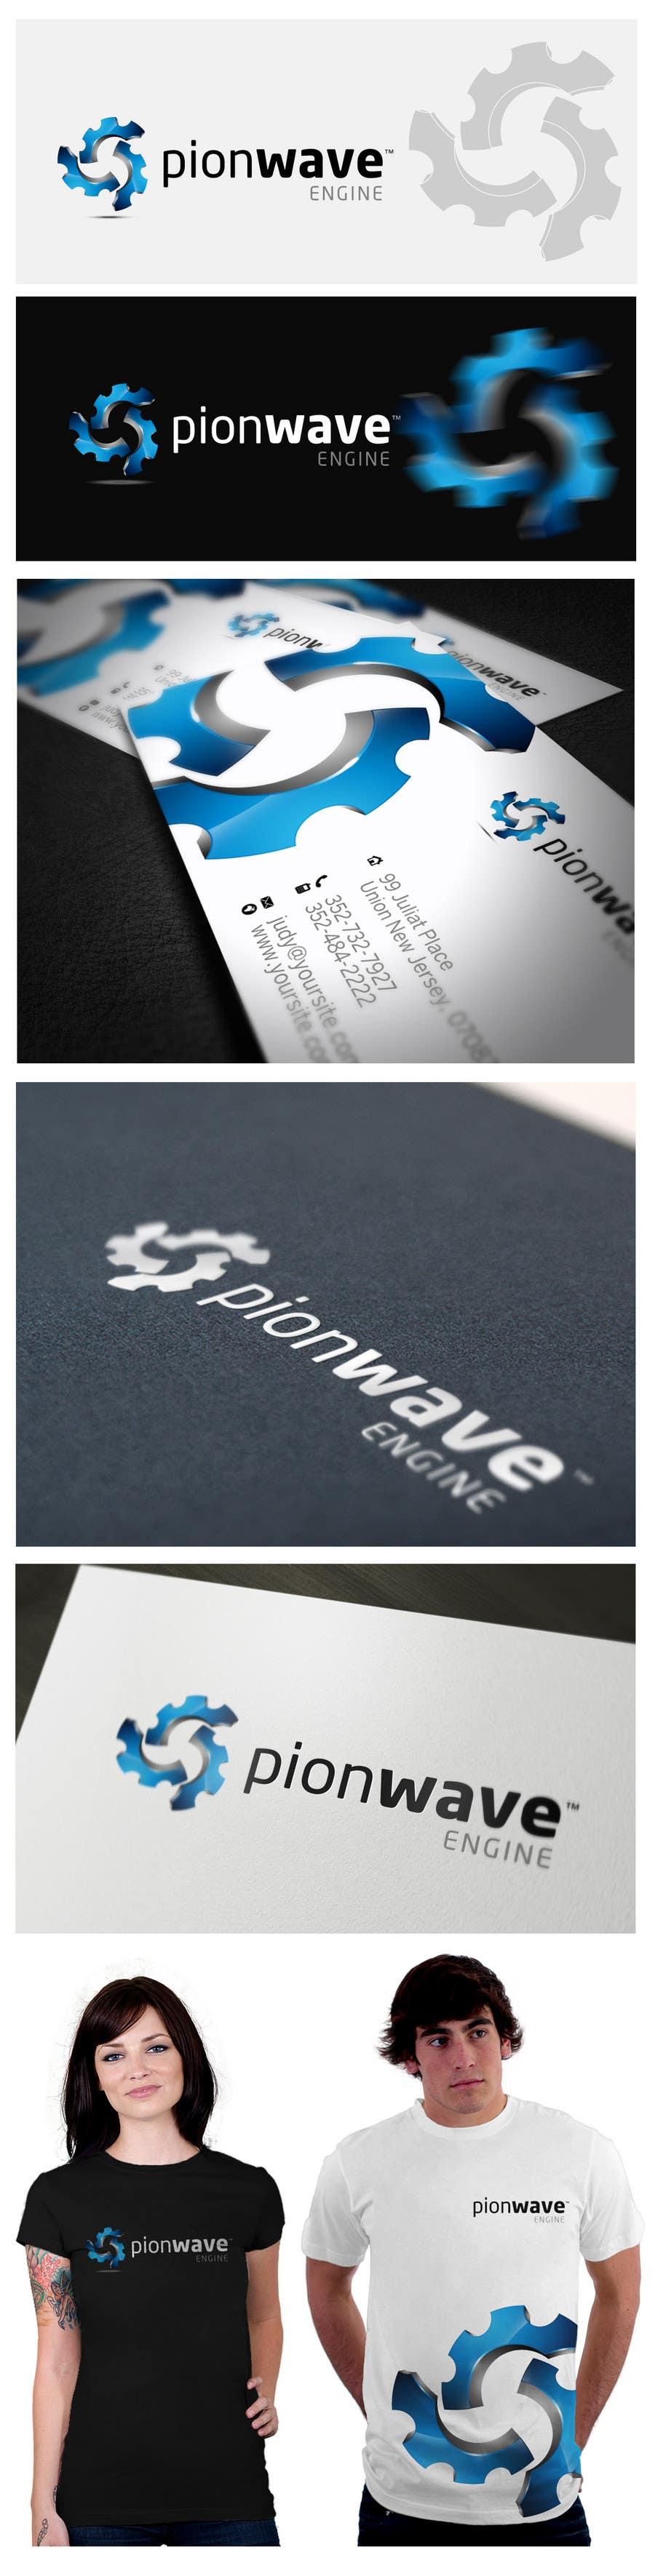 "#242 for Logo Design for ""PionWave Engine"" by maidenbrands"